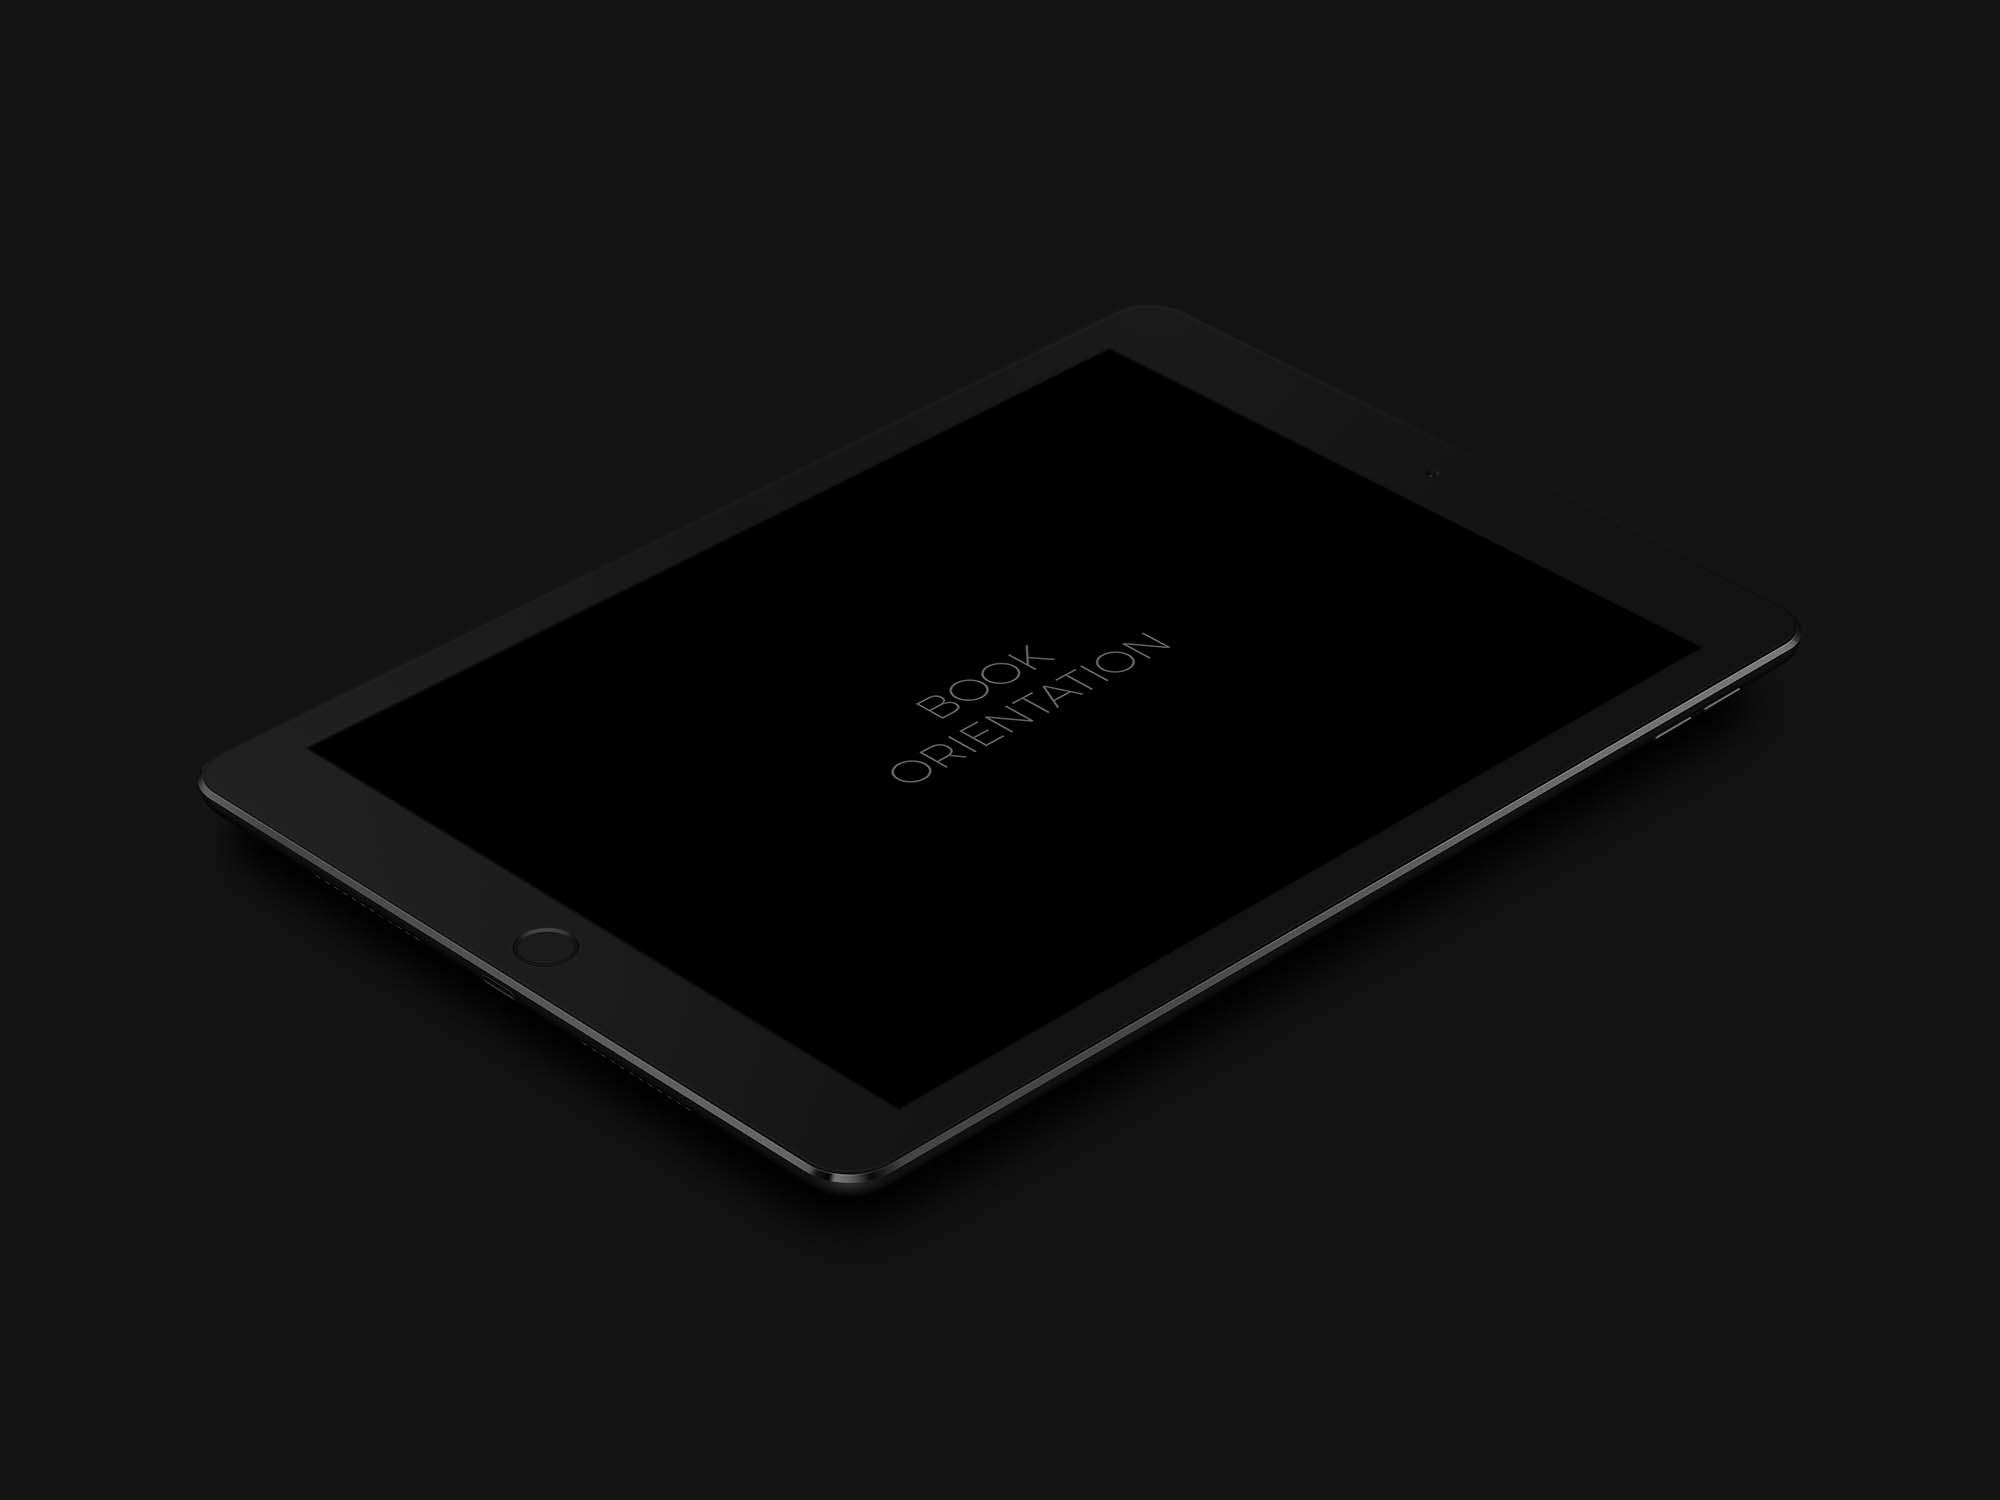 iPad Pro 9.7 Dark Mockup